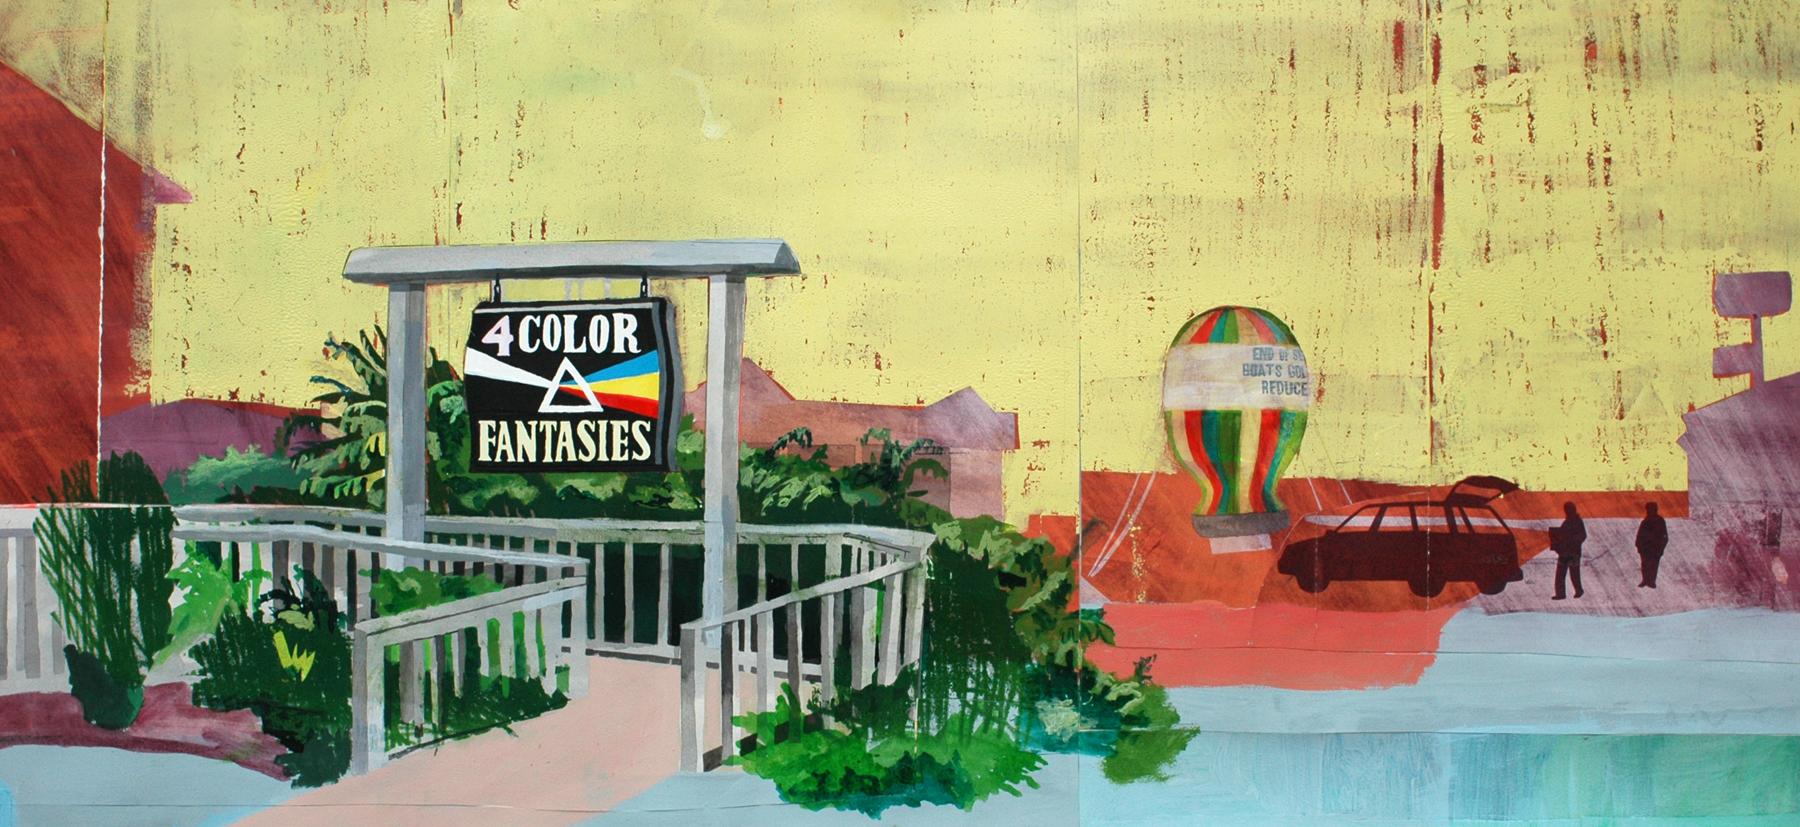 4-Color Fantasies